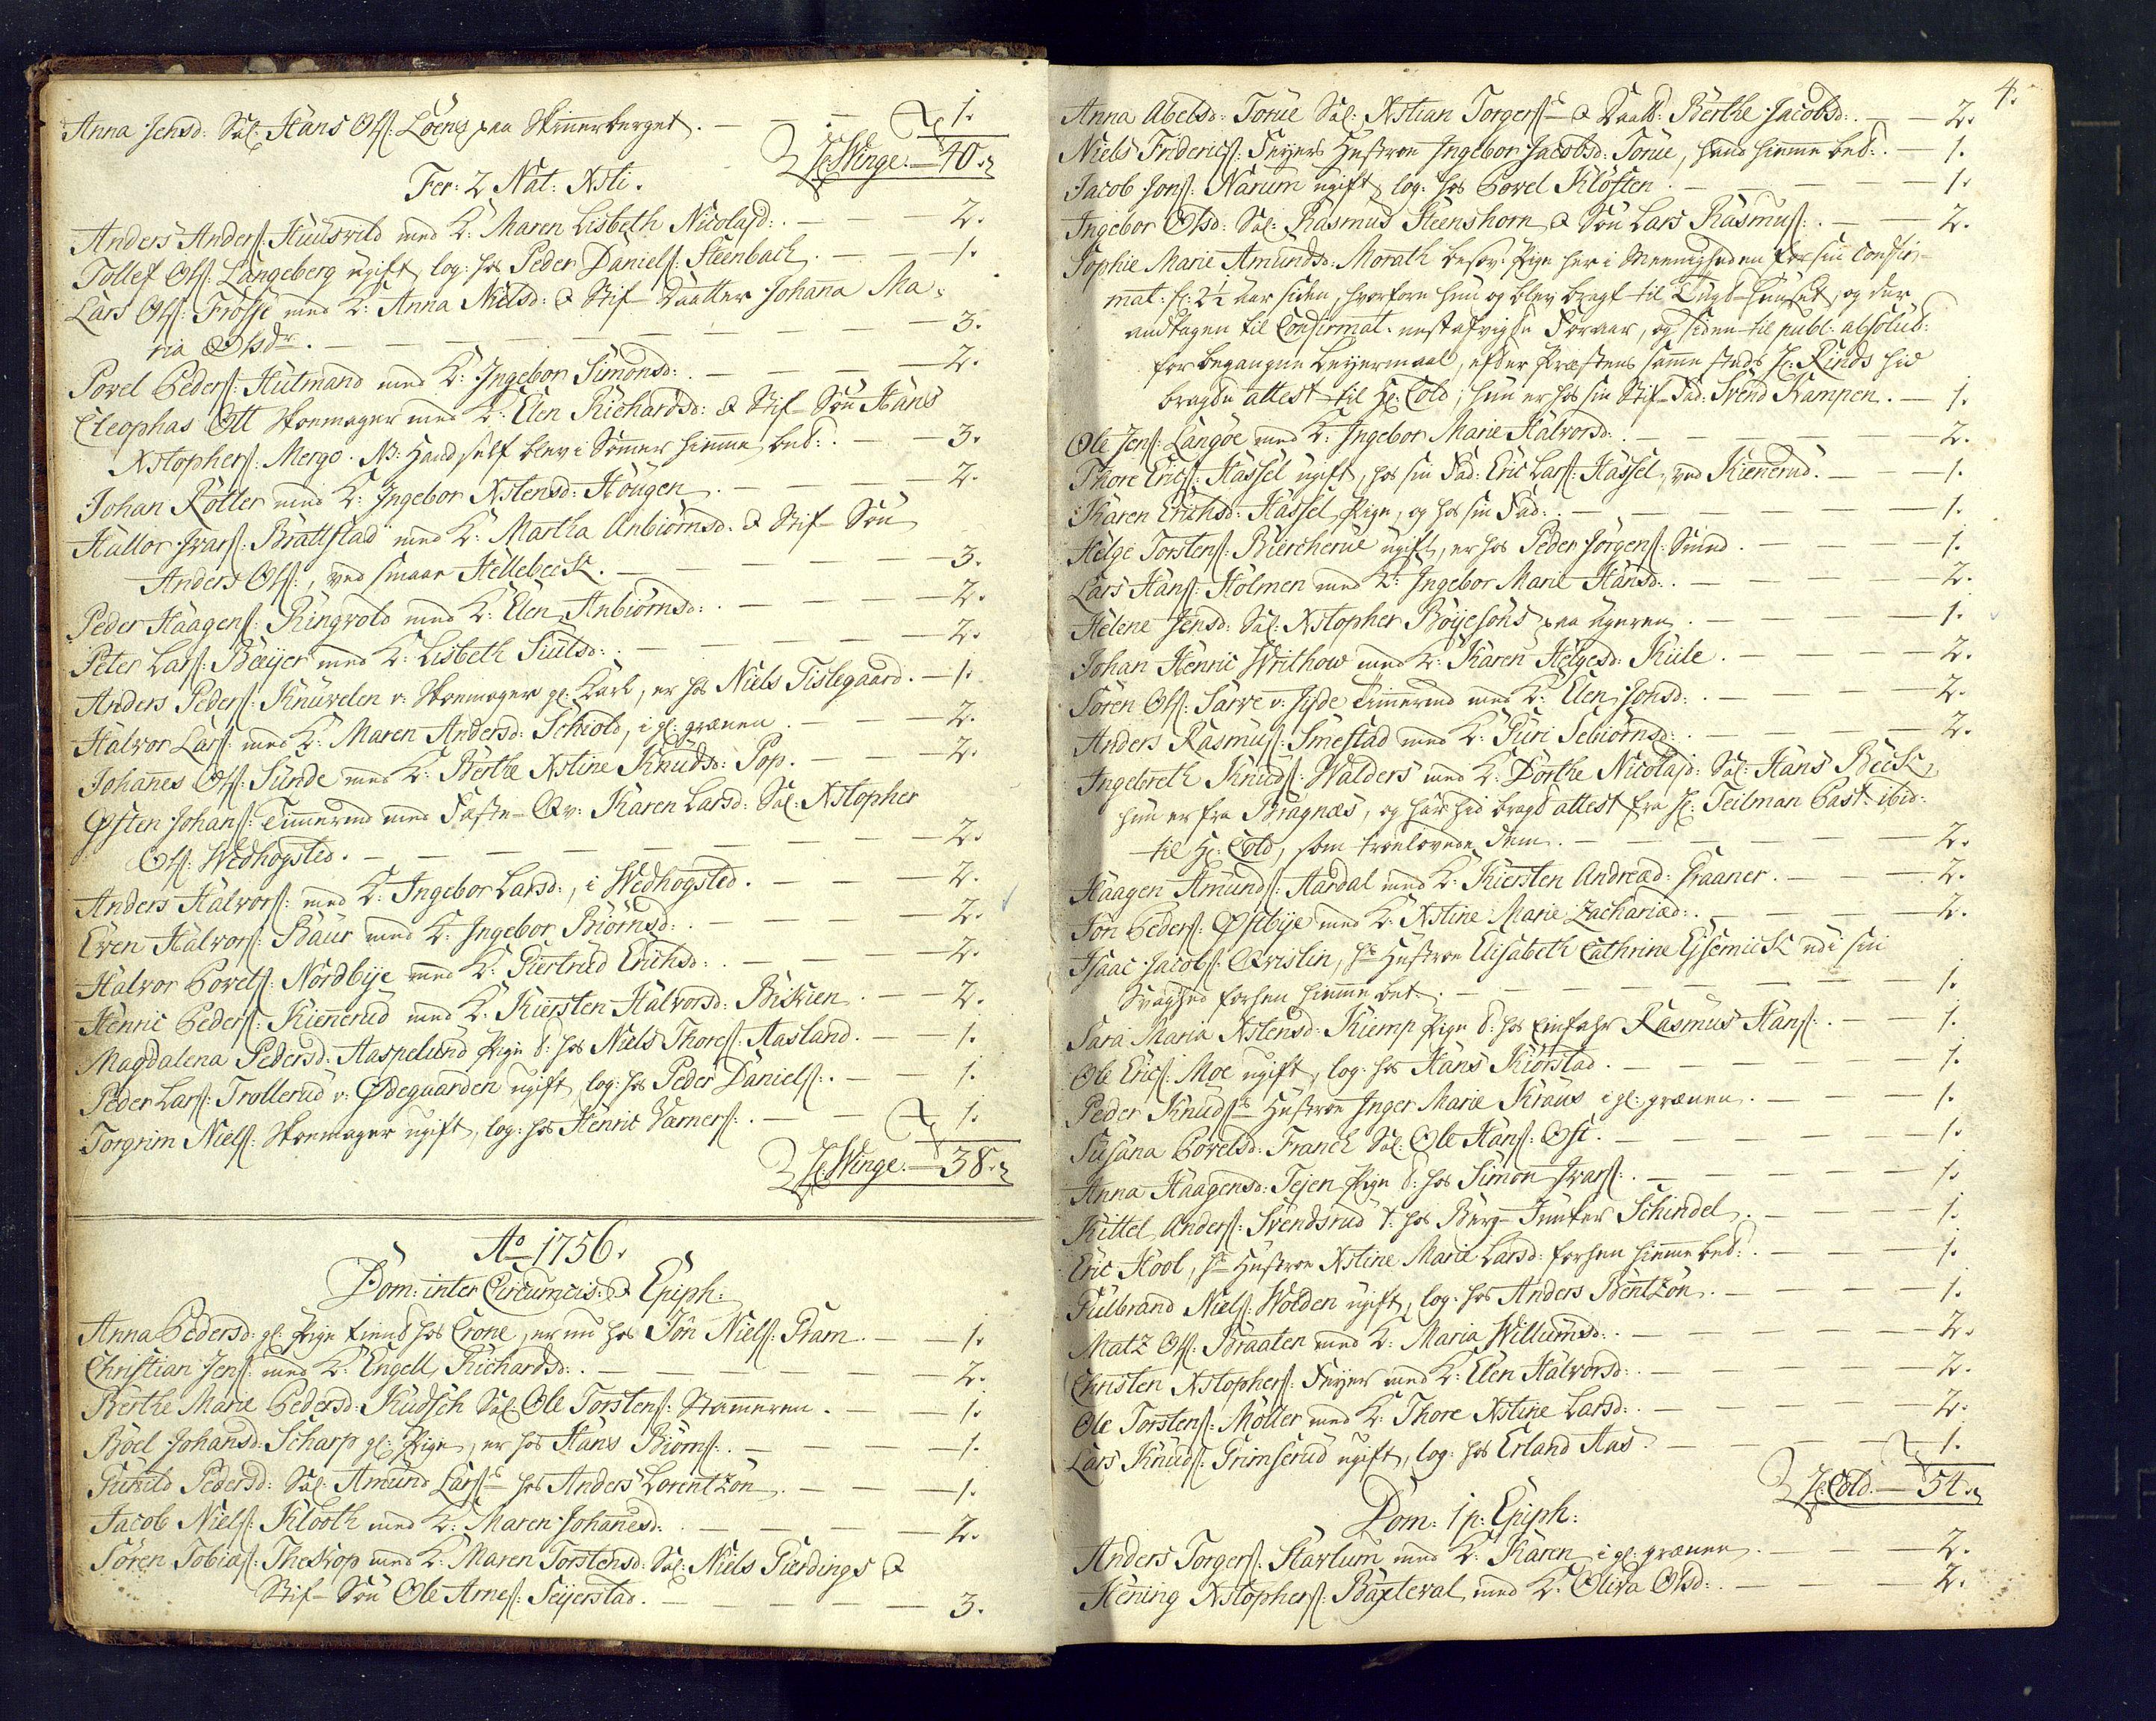 SAKO, Kongsberg kirkebøker, M/Ma/L0005: Kommunikantprotokoll nr. 5, 1755-1761, s. 4